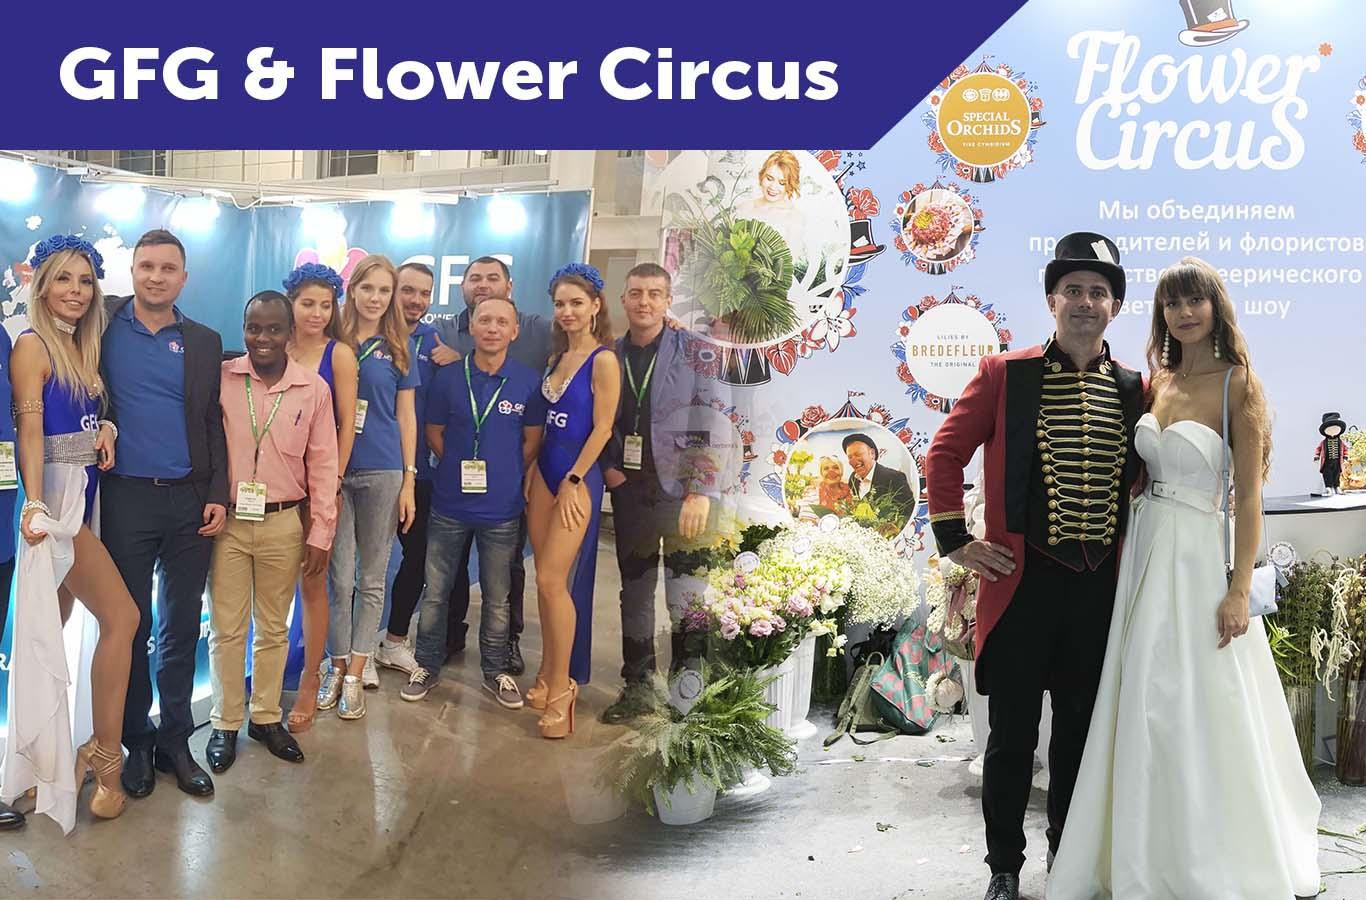 GFG&FlowerCircus